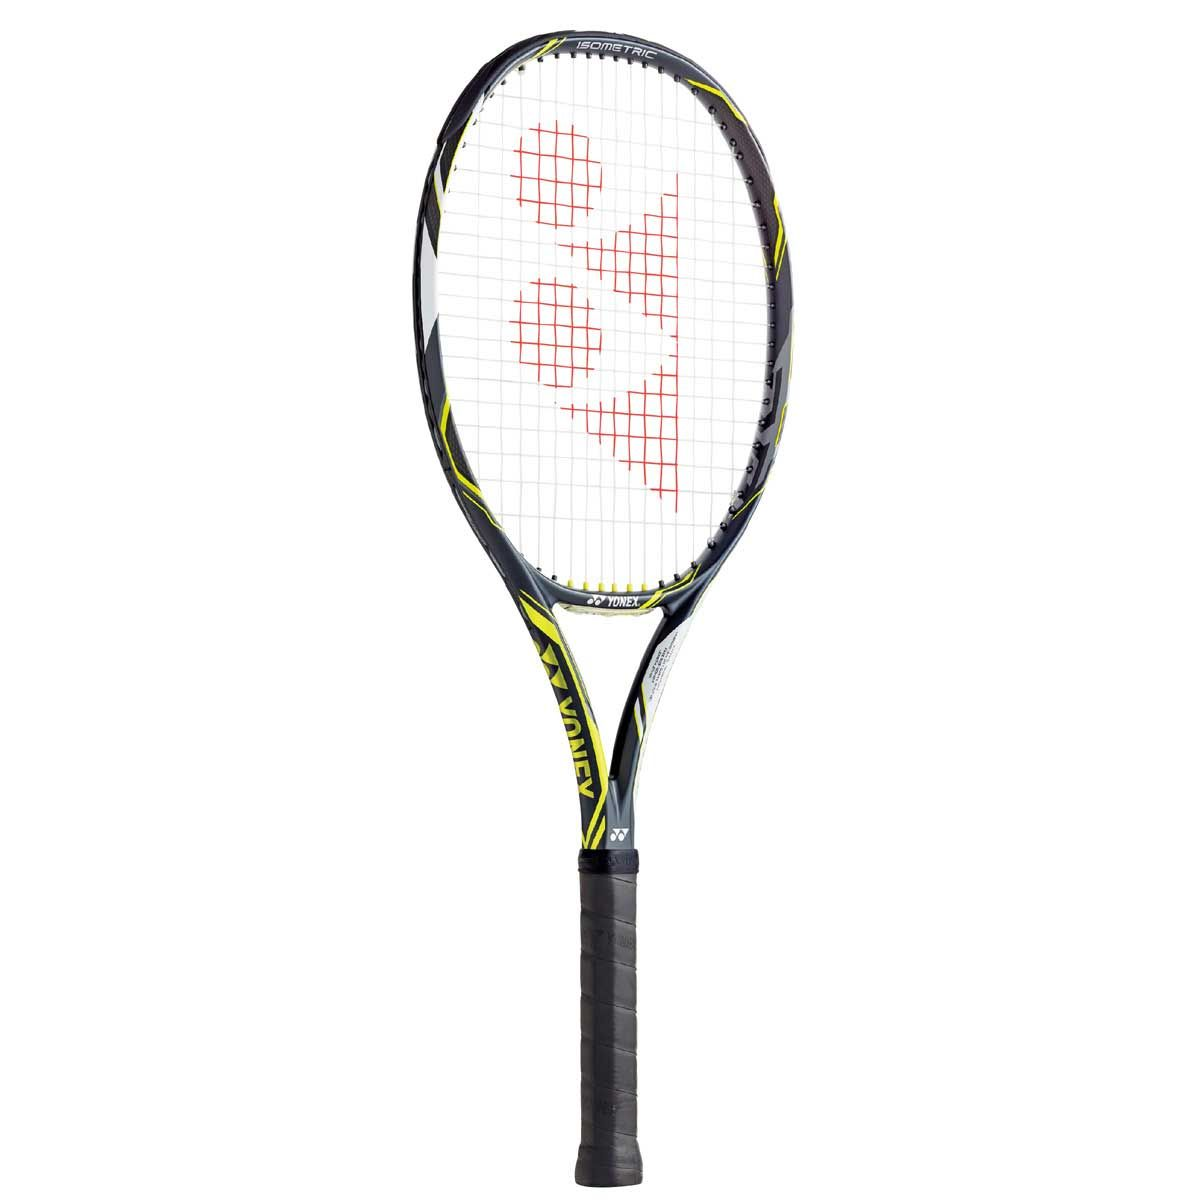 Yonex Ezone Dr 100 Tennis Racquet 300 Gm Unstrung Tennis Racquet Tennis Racquets